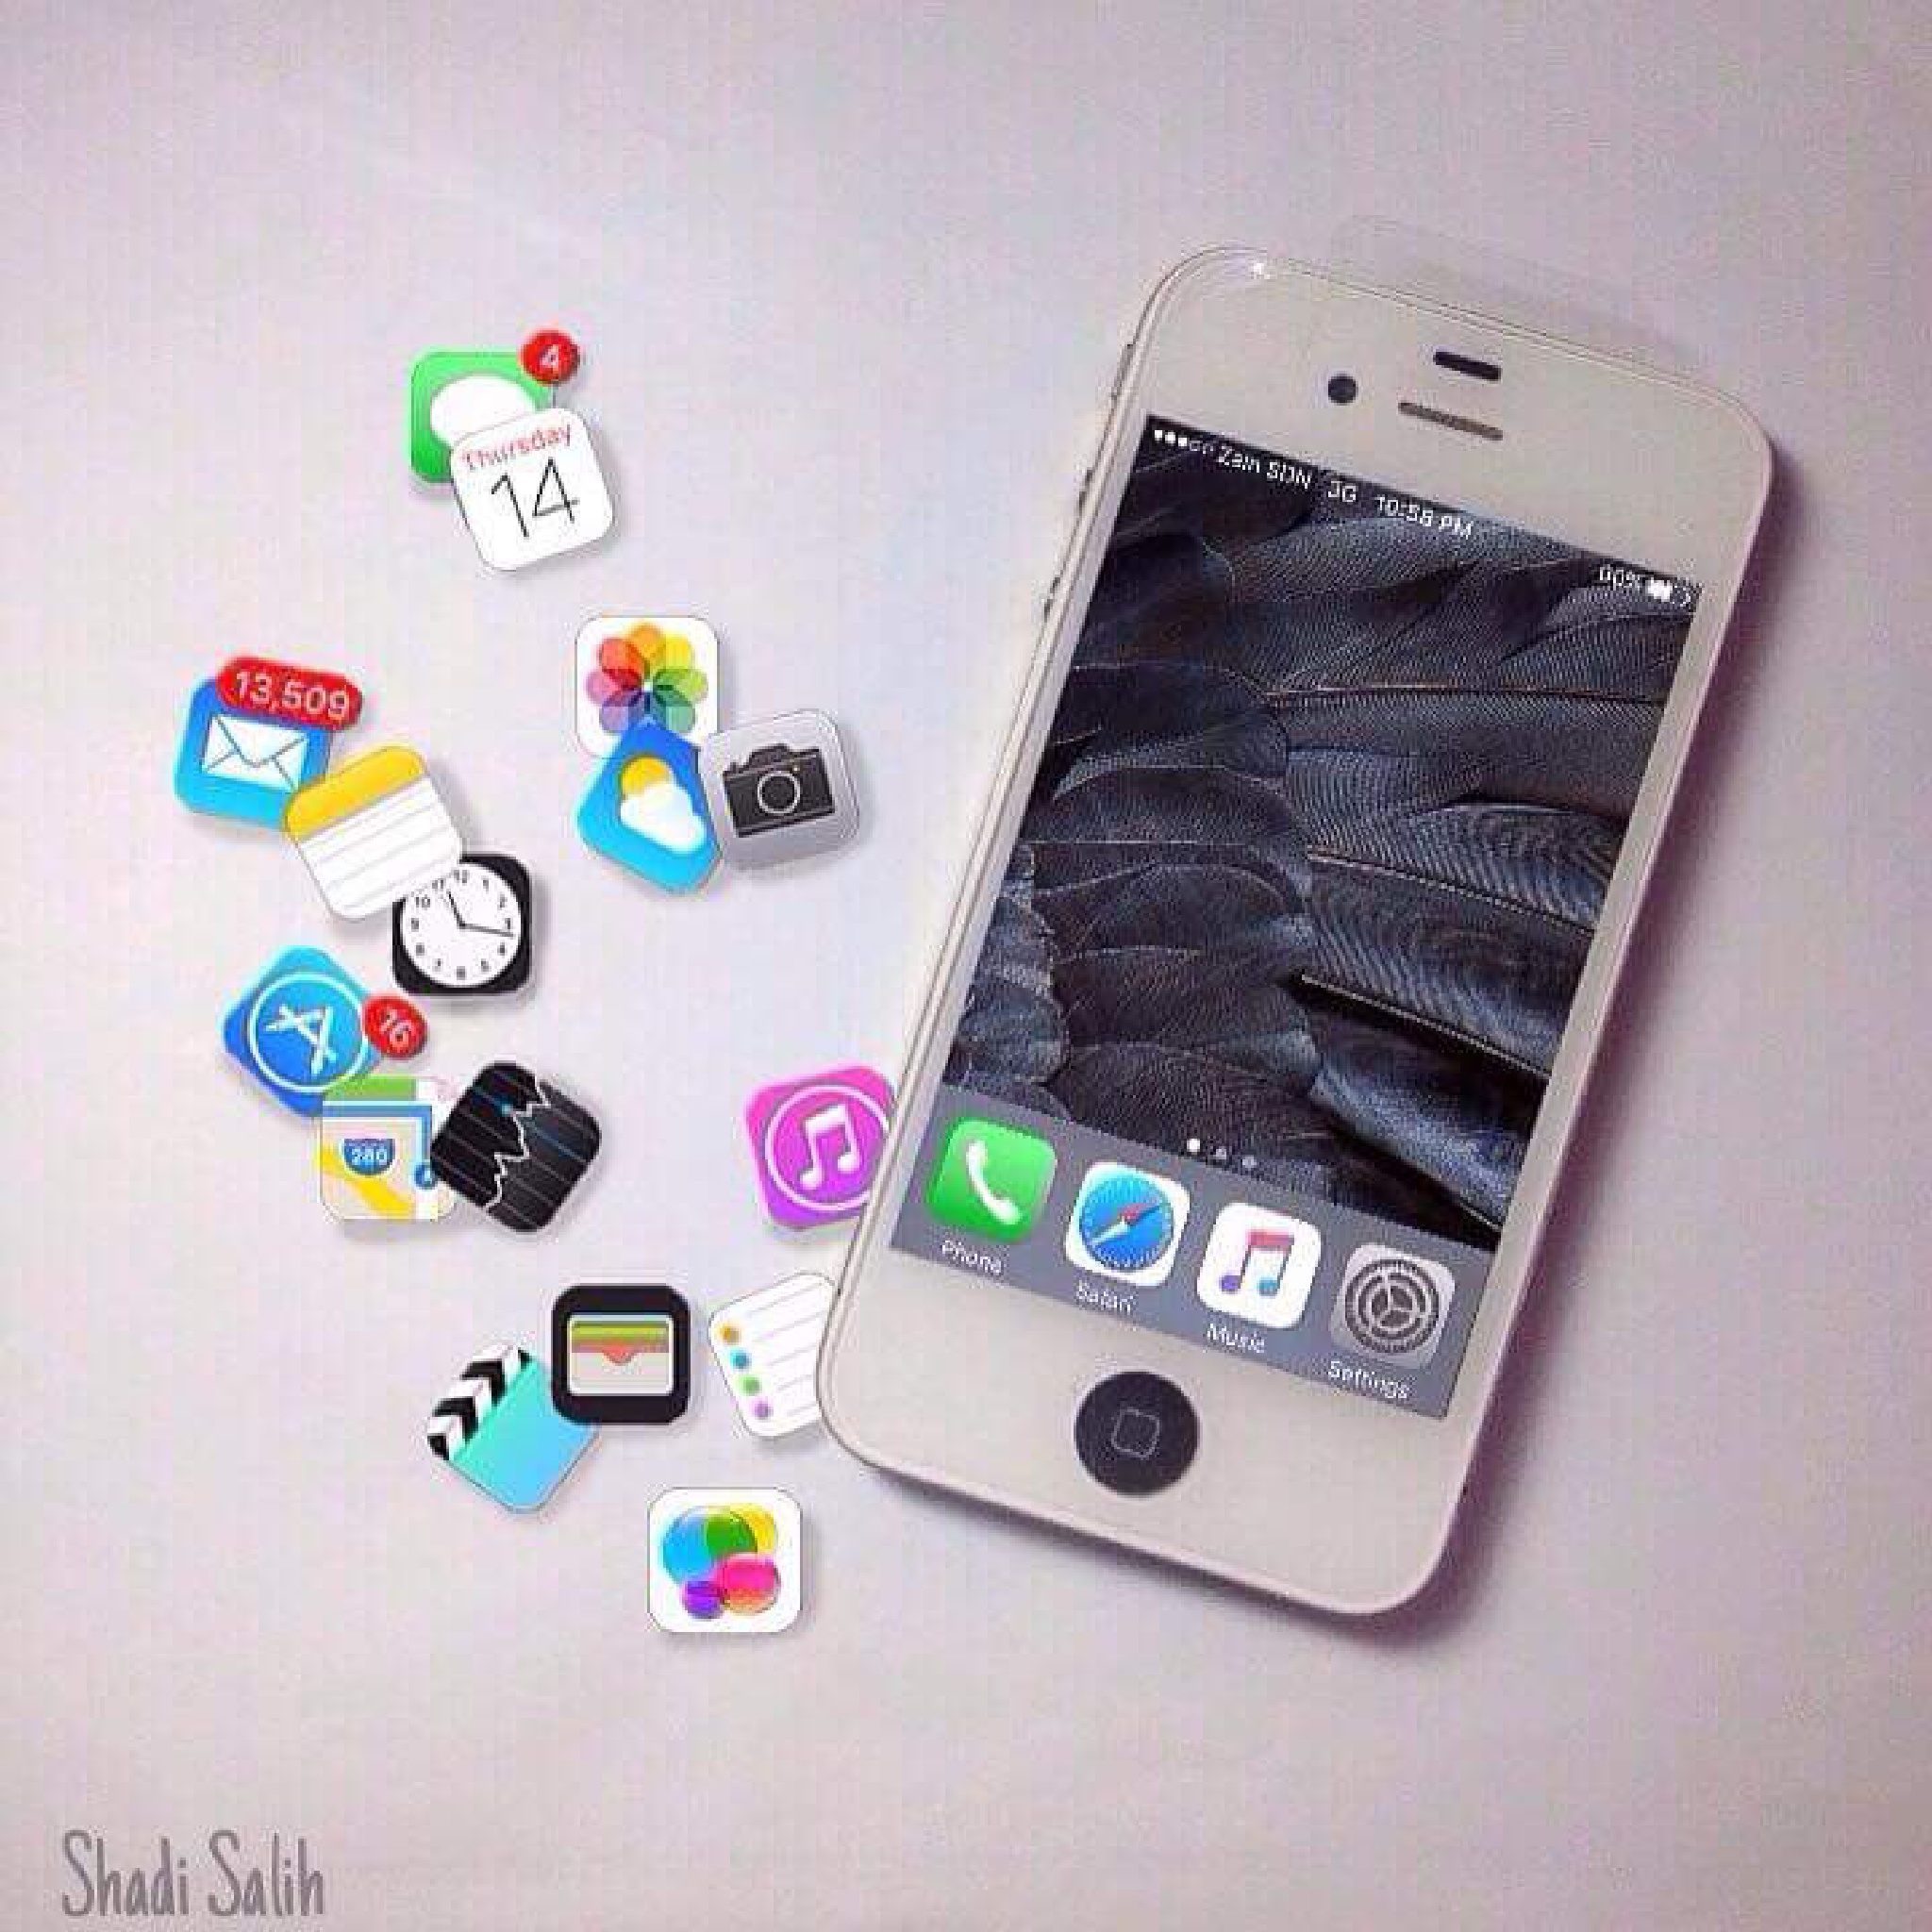 Icons by shadisalih